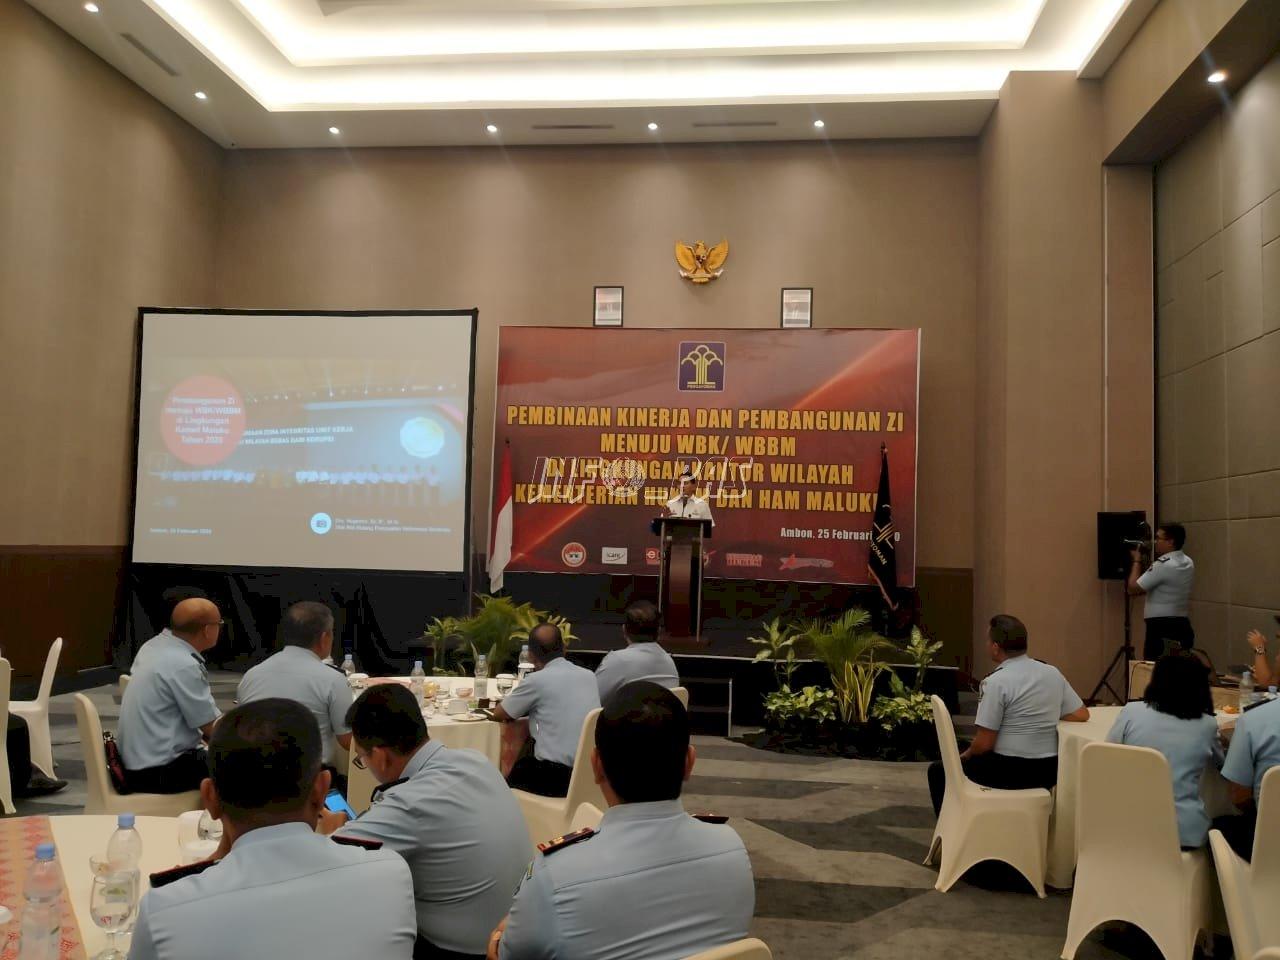 Kejar Predikat WBK/WBBM, Kanwil Maluku Gelar Pembinaan Kinerja & Pembangunan ZI